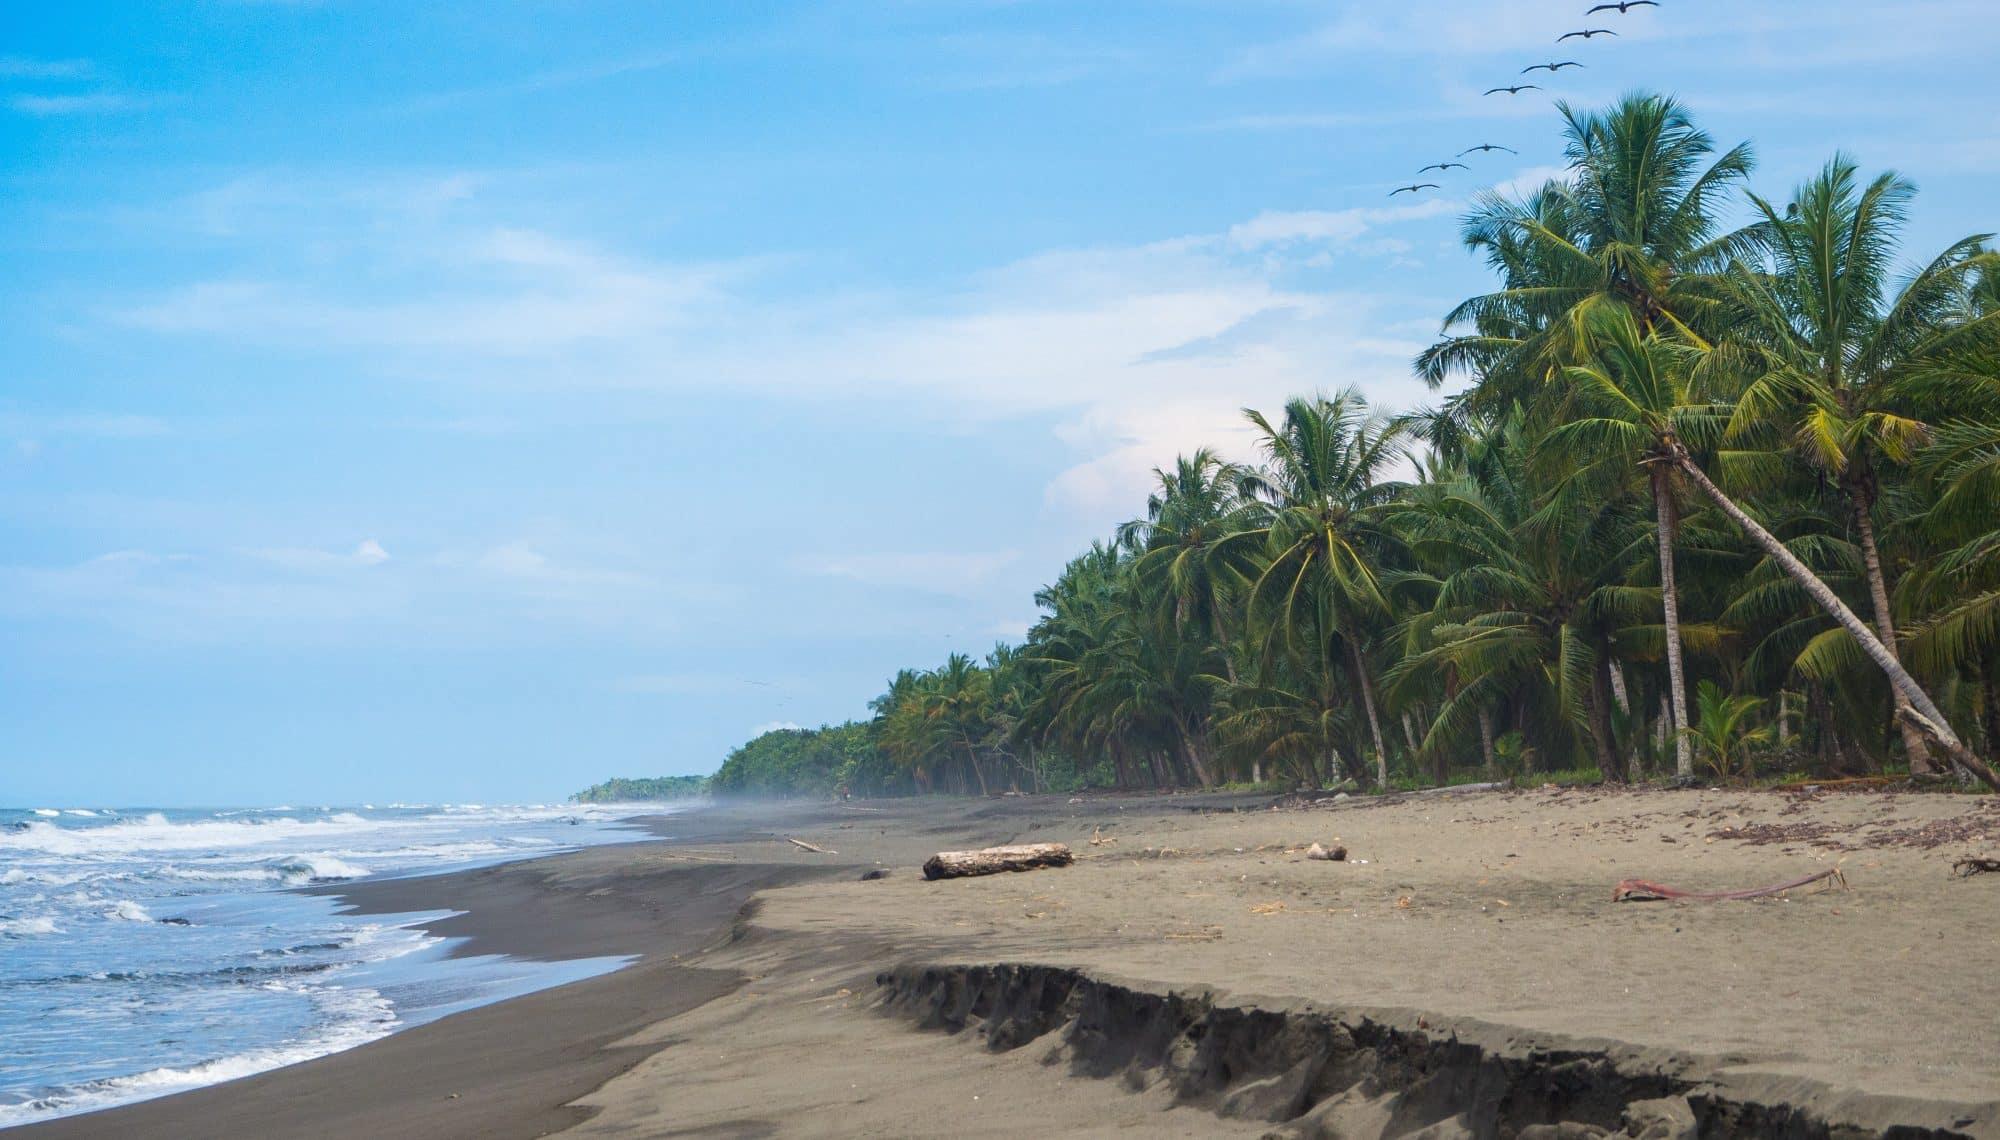 Save Sea Turtles on Costa Rica's Caribbean Coast